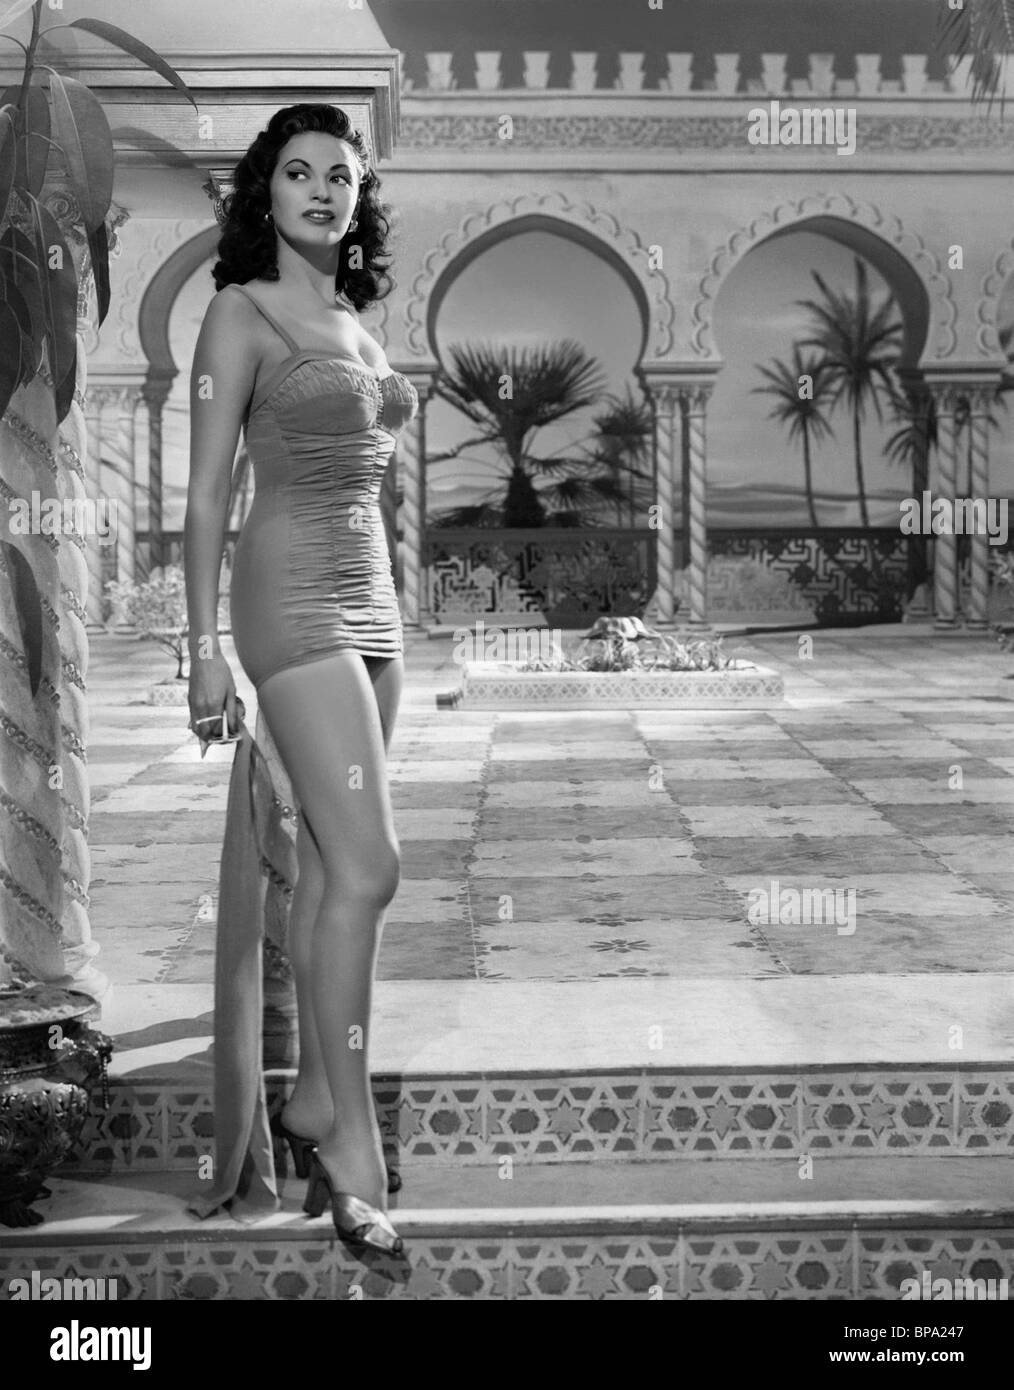 YVONNE DE CARLO PUBLICITY SHOT HOTEL SAHARA (1951) - Stock Image